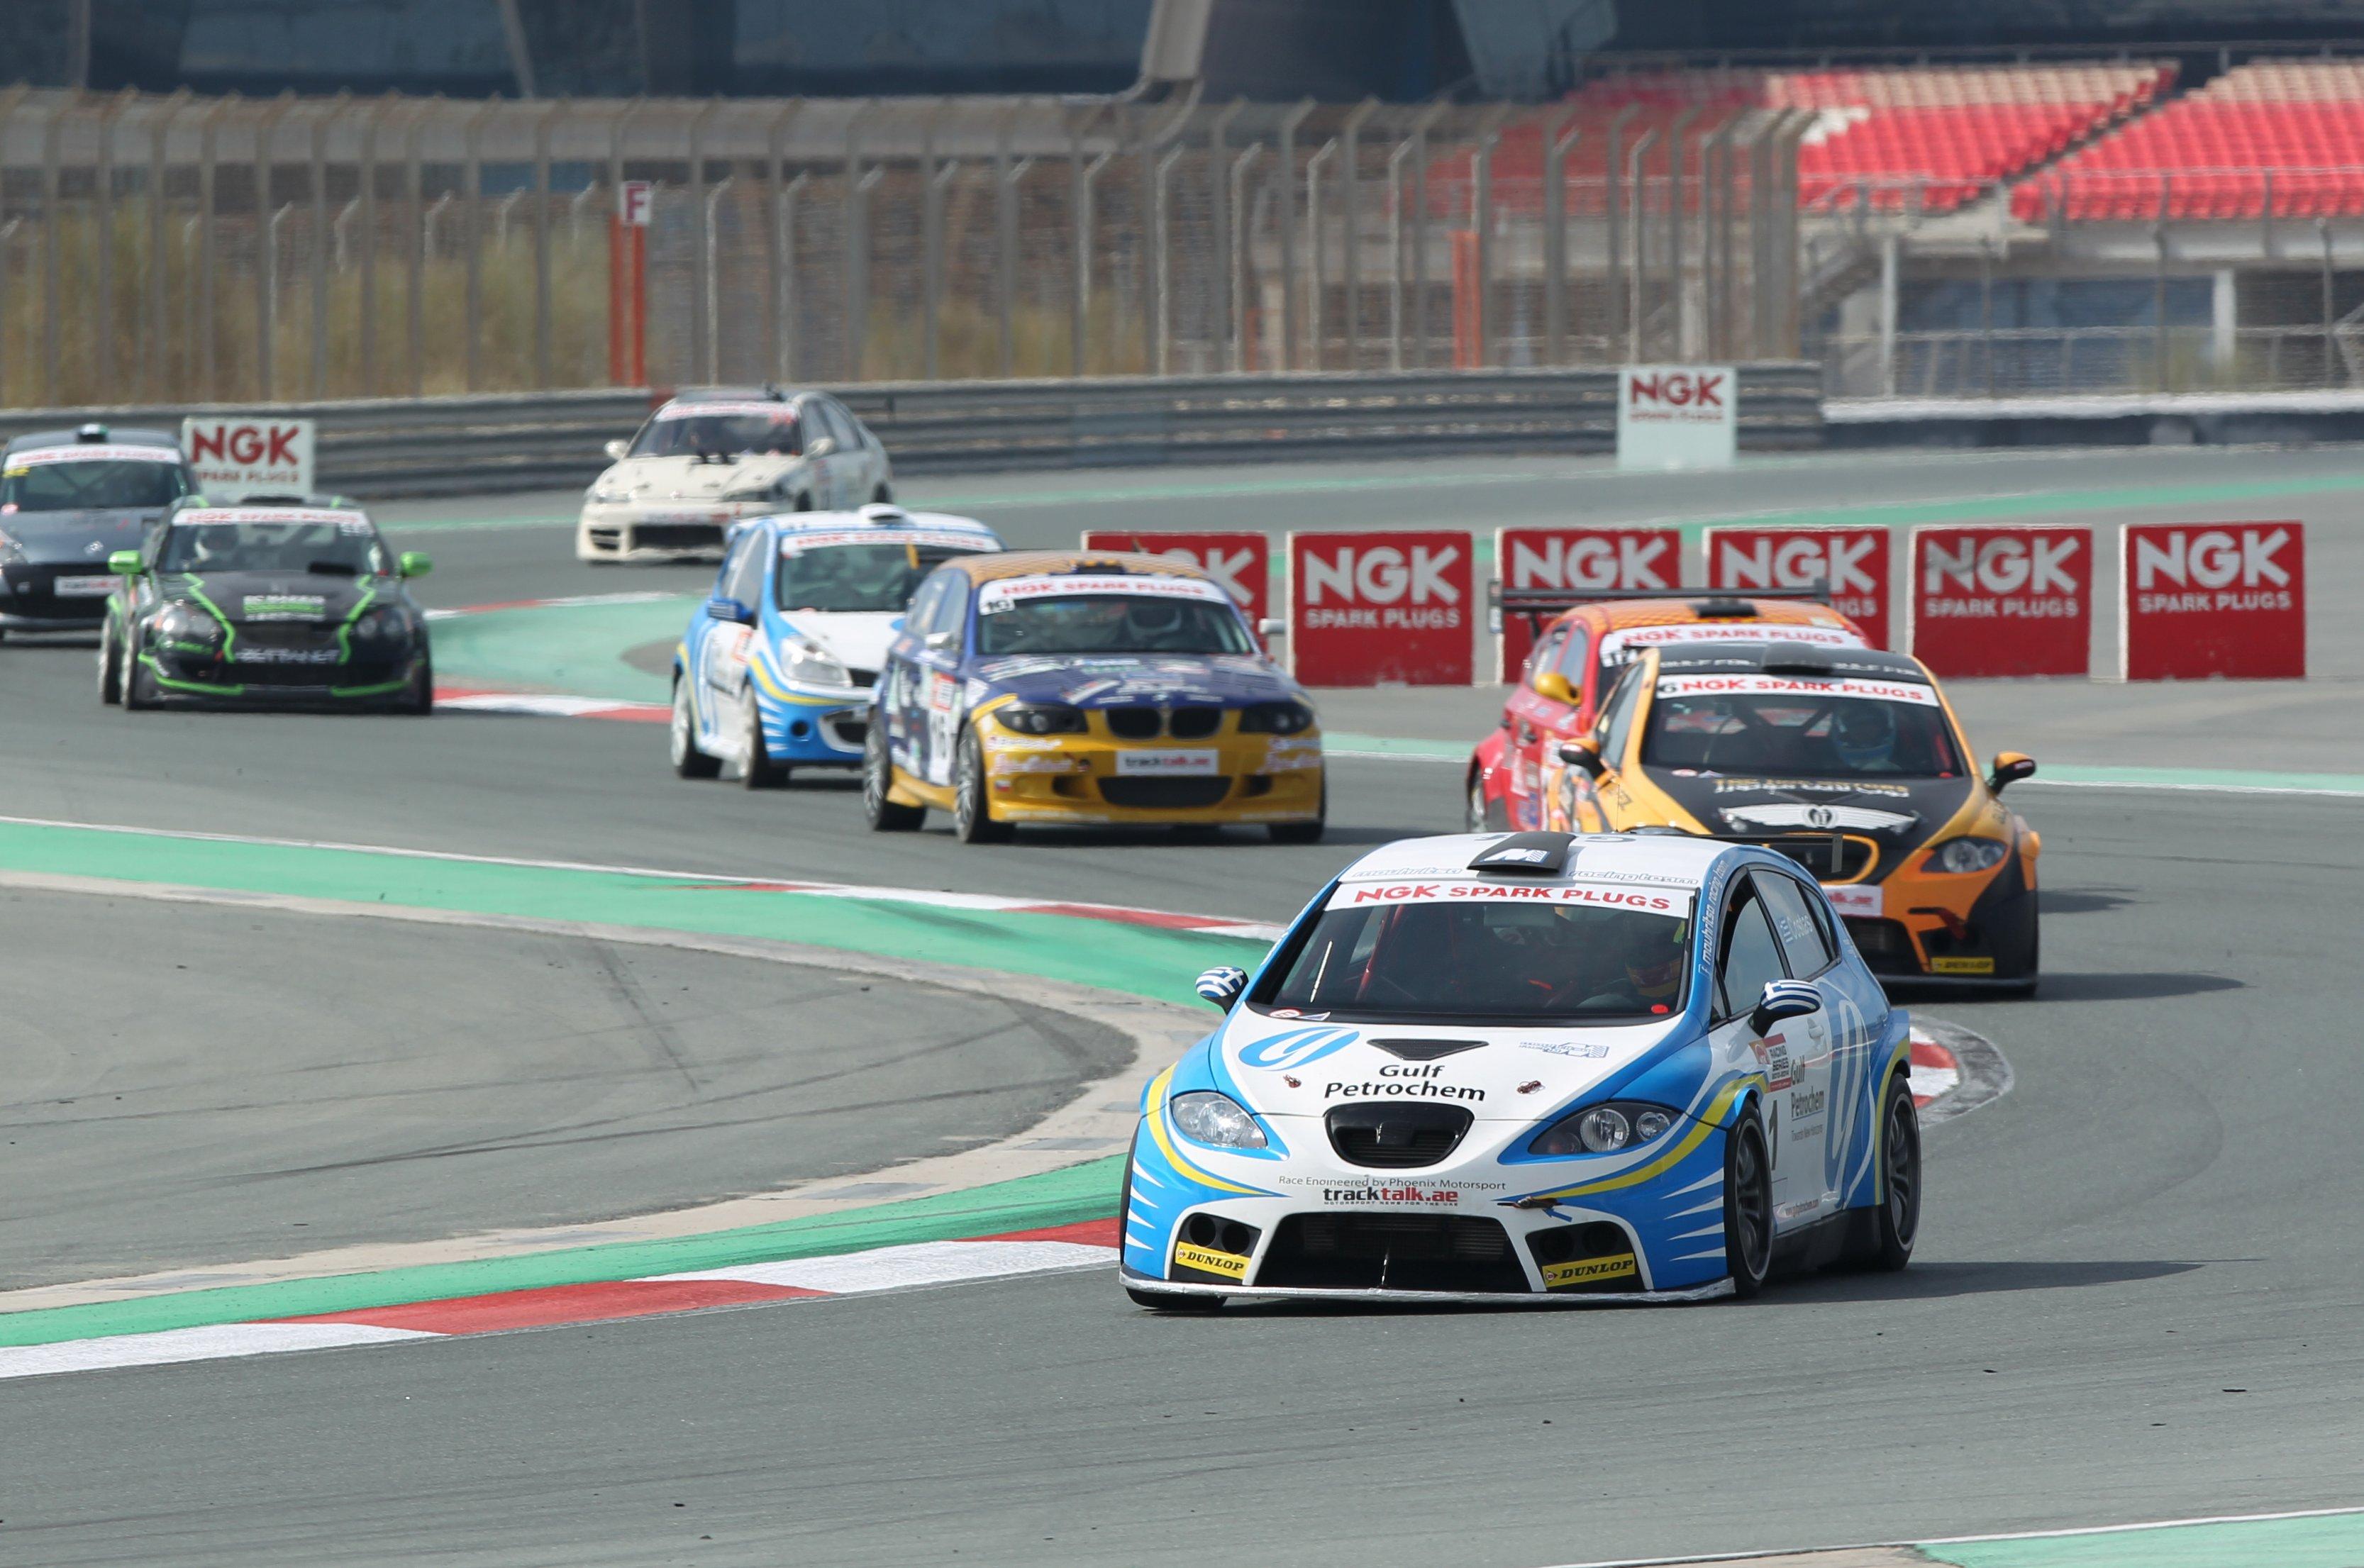 UAE: NGK Racing Series kicks off this weekend at Yas Marina Circuit